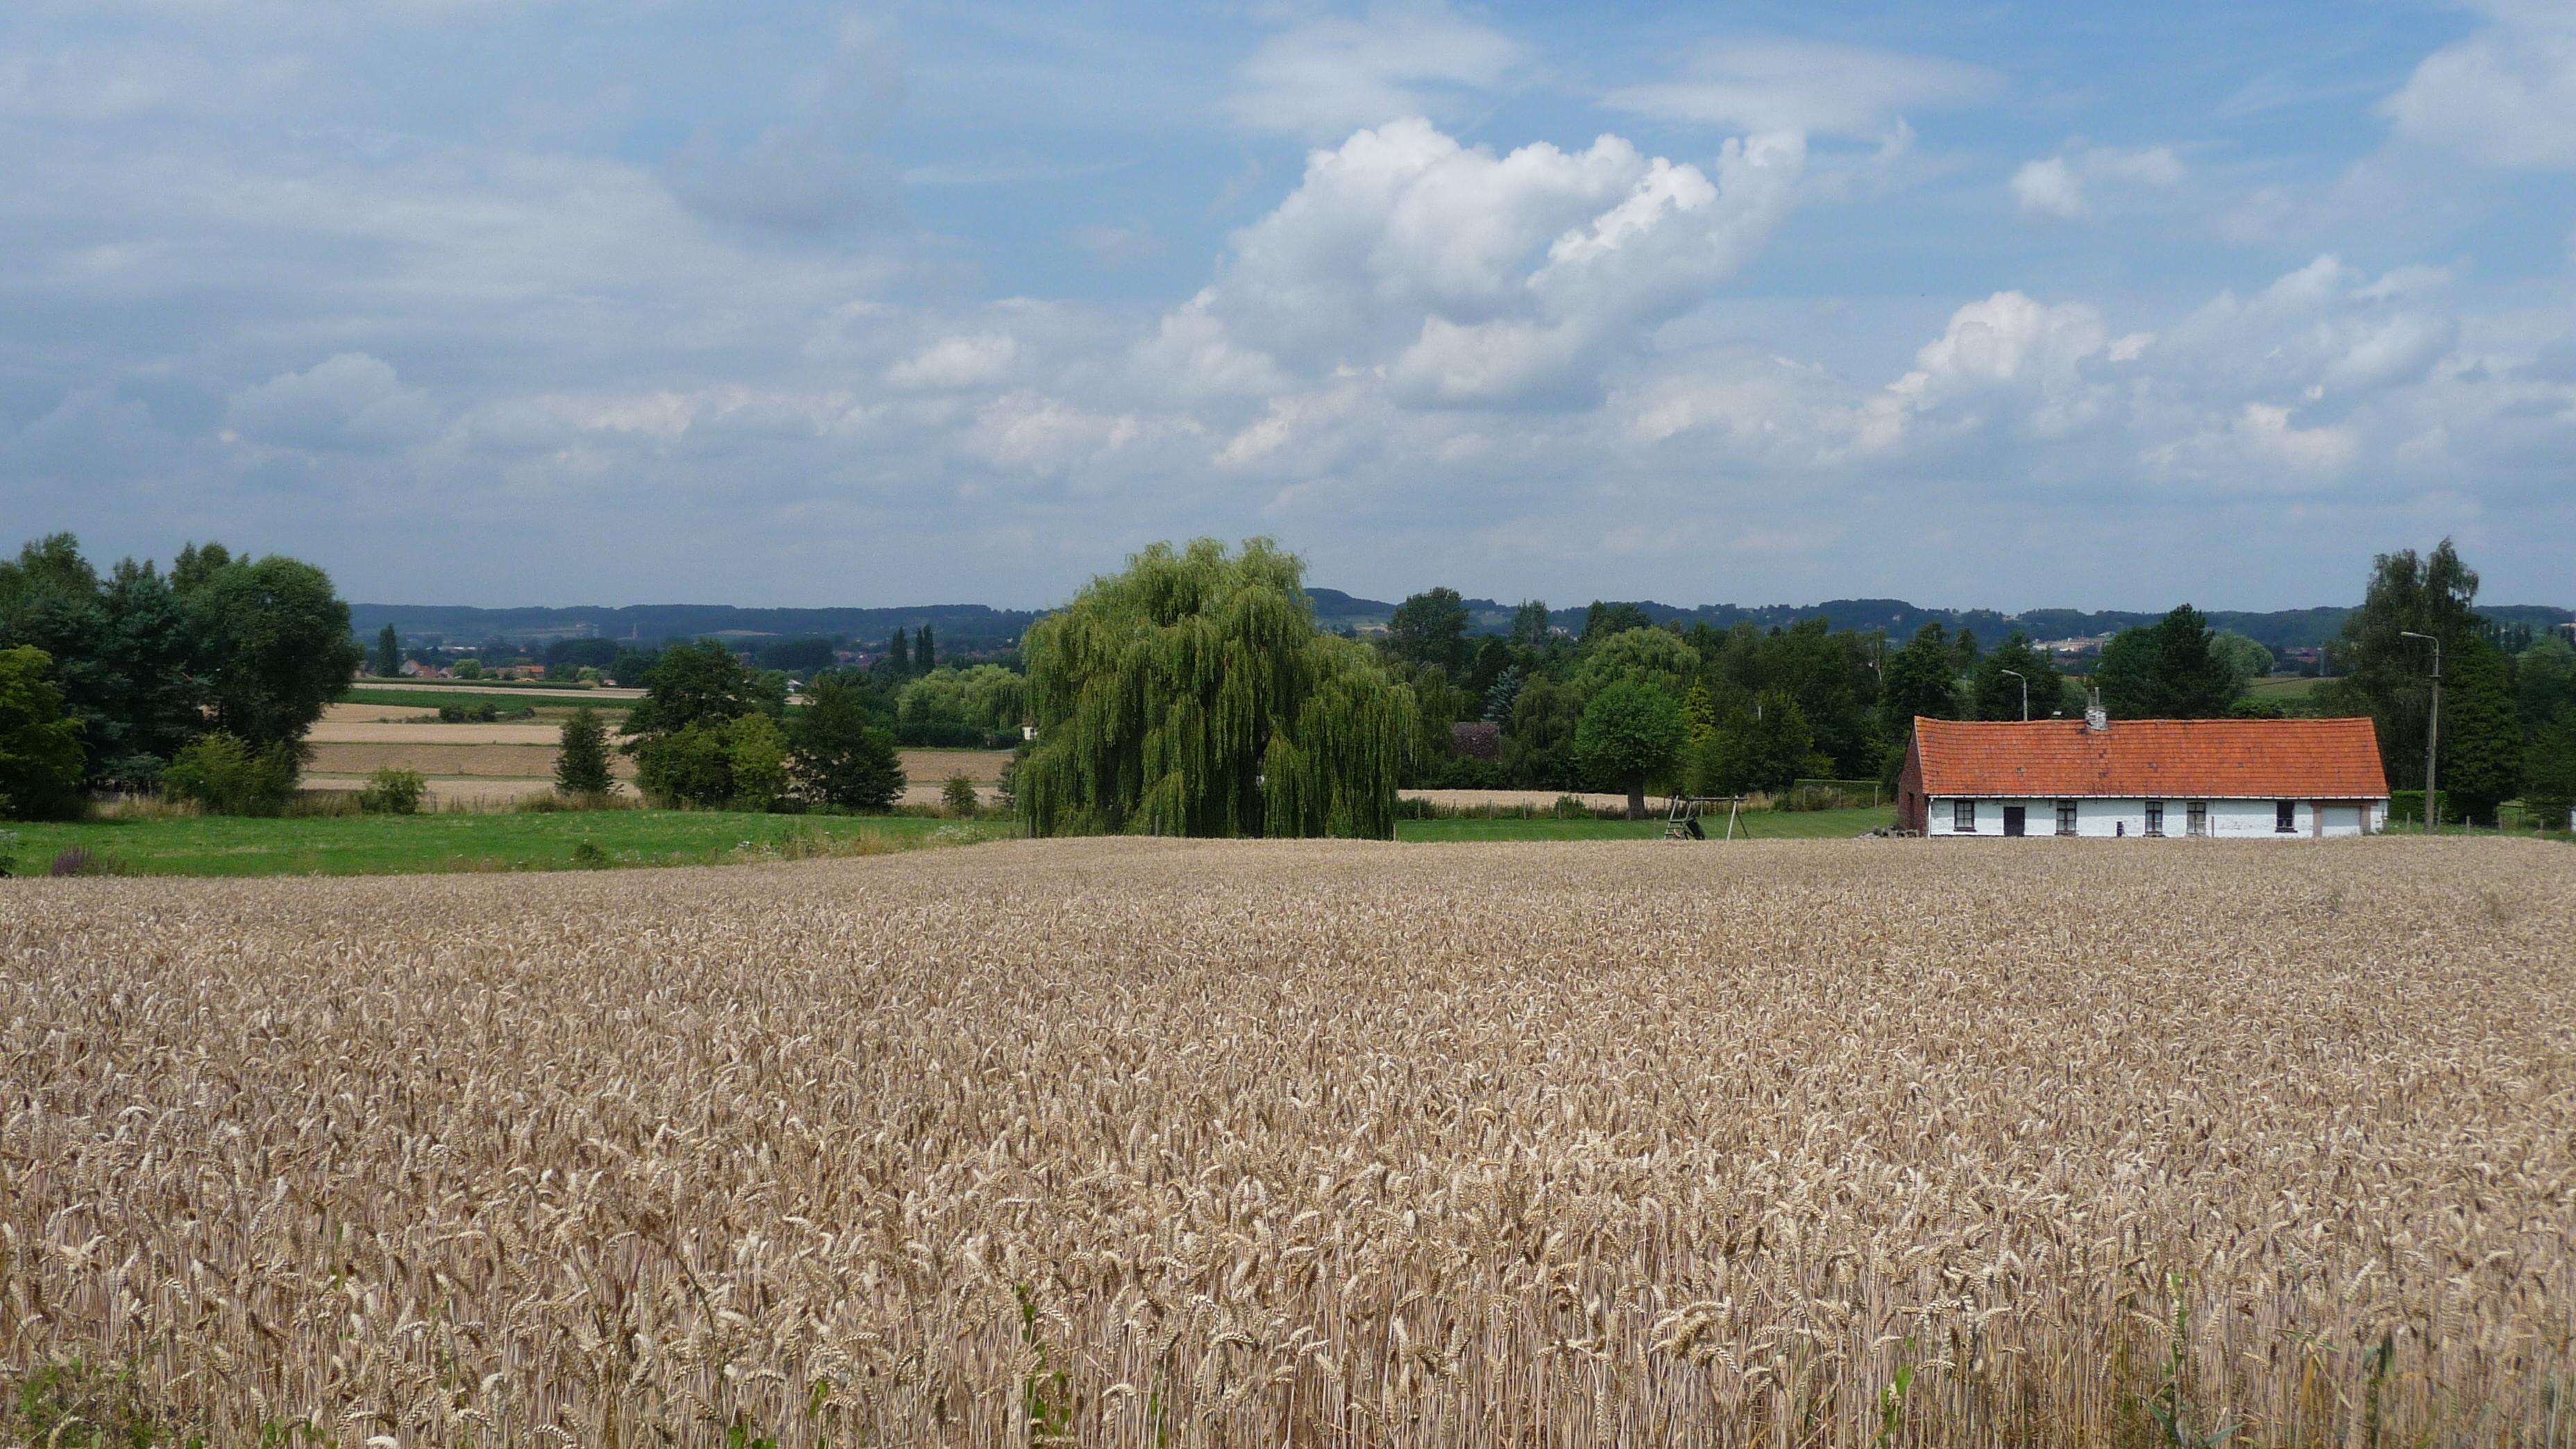 Walking around Frasnes-les-Anvaing